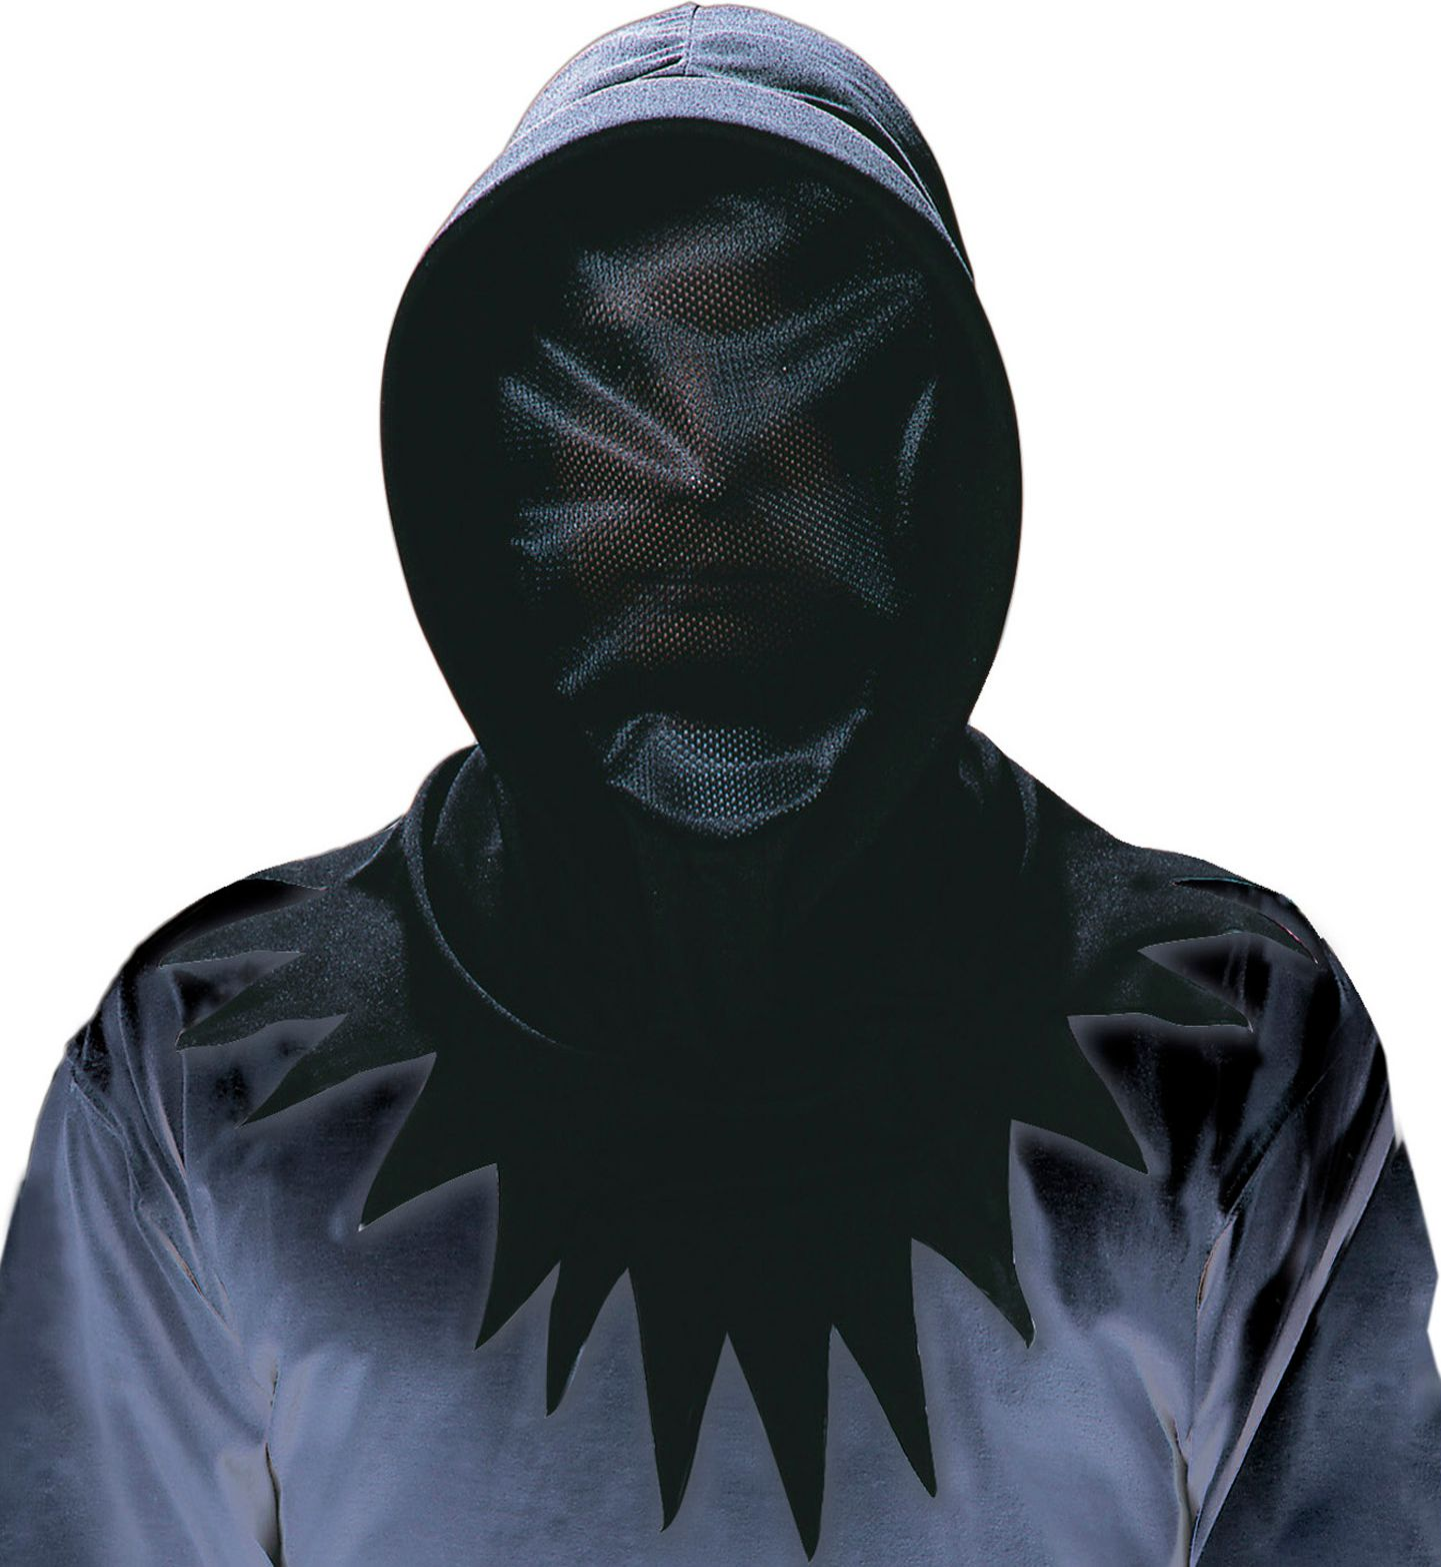 Gezichtsbedekking masker zwart